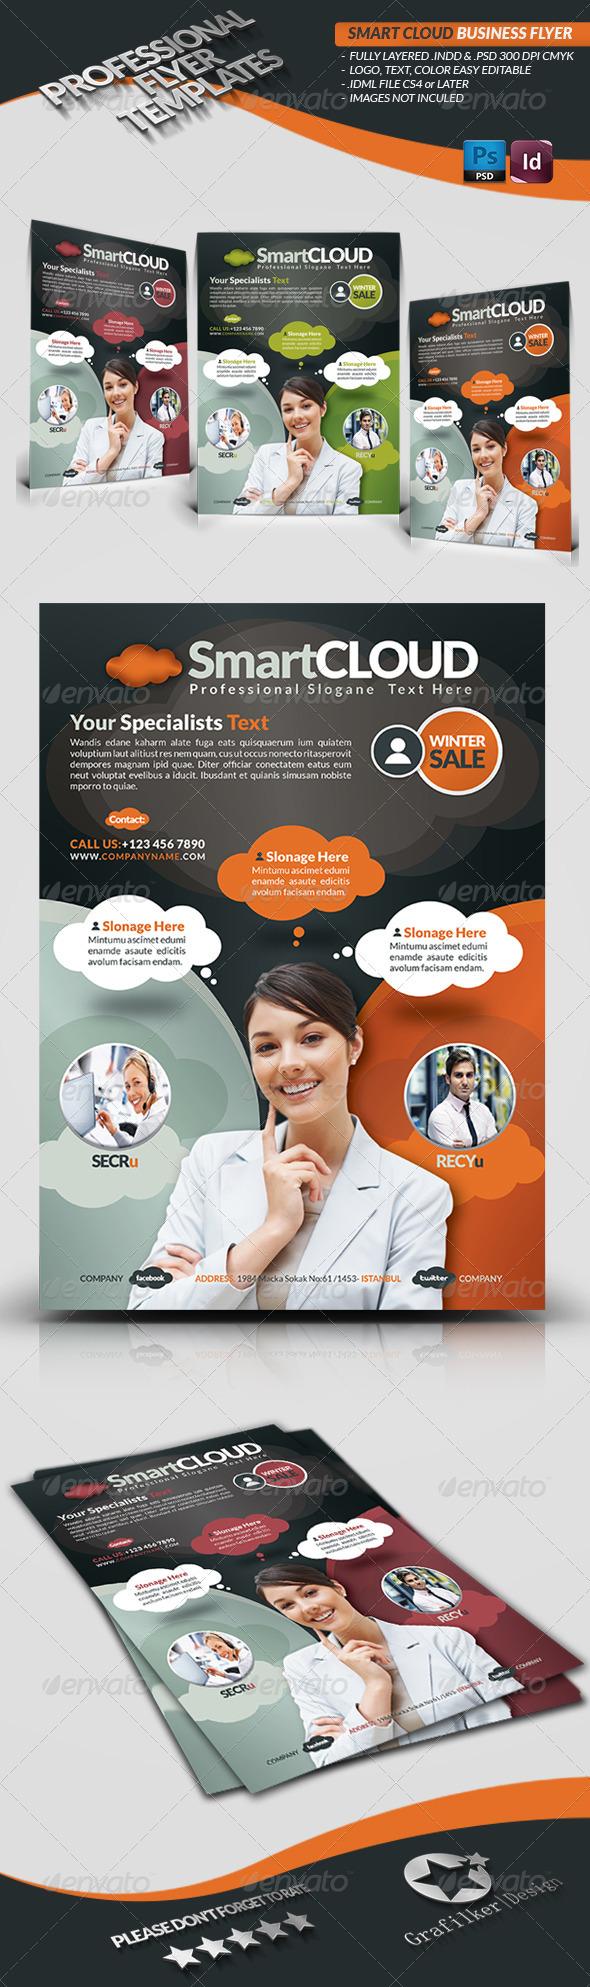 Smart Cloud Business Flyer - Corporate Flyers